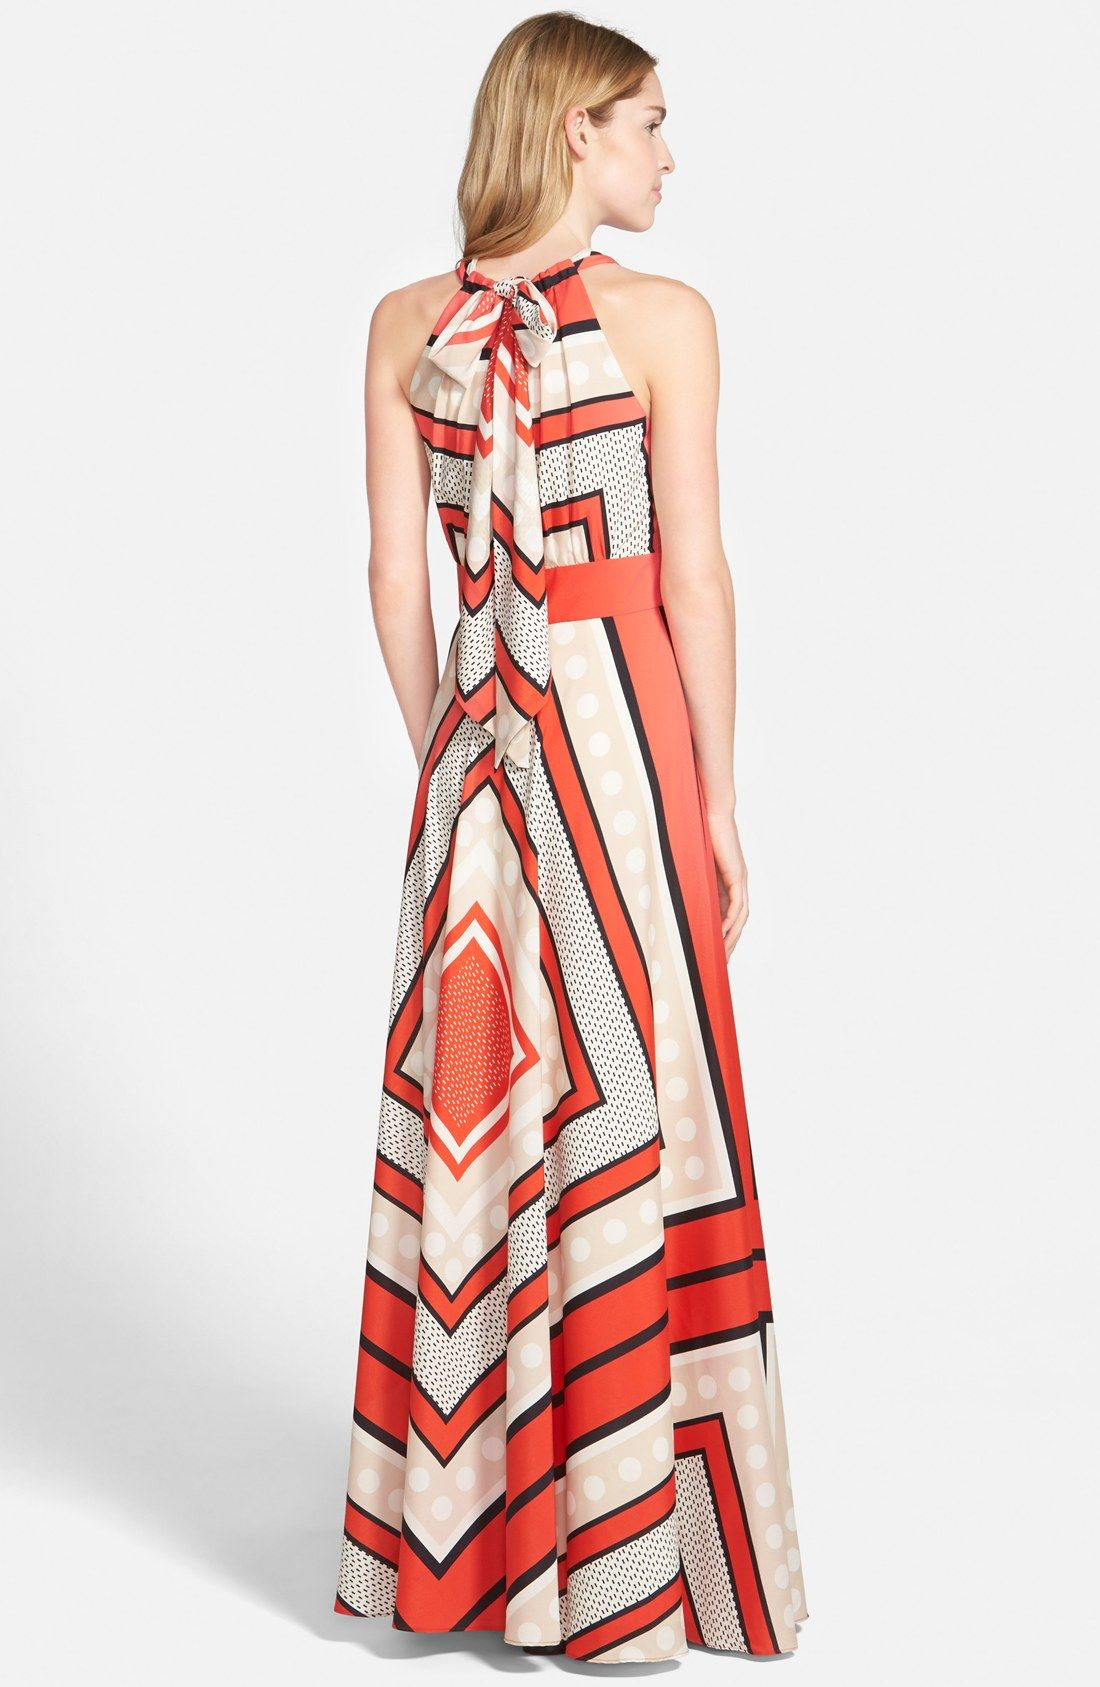 Eliza J Scarf Print Crêpe de Chine Fit & Flare Maxi Dress